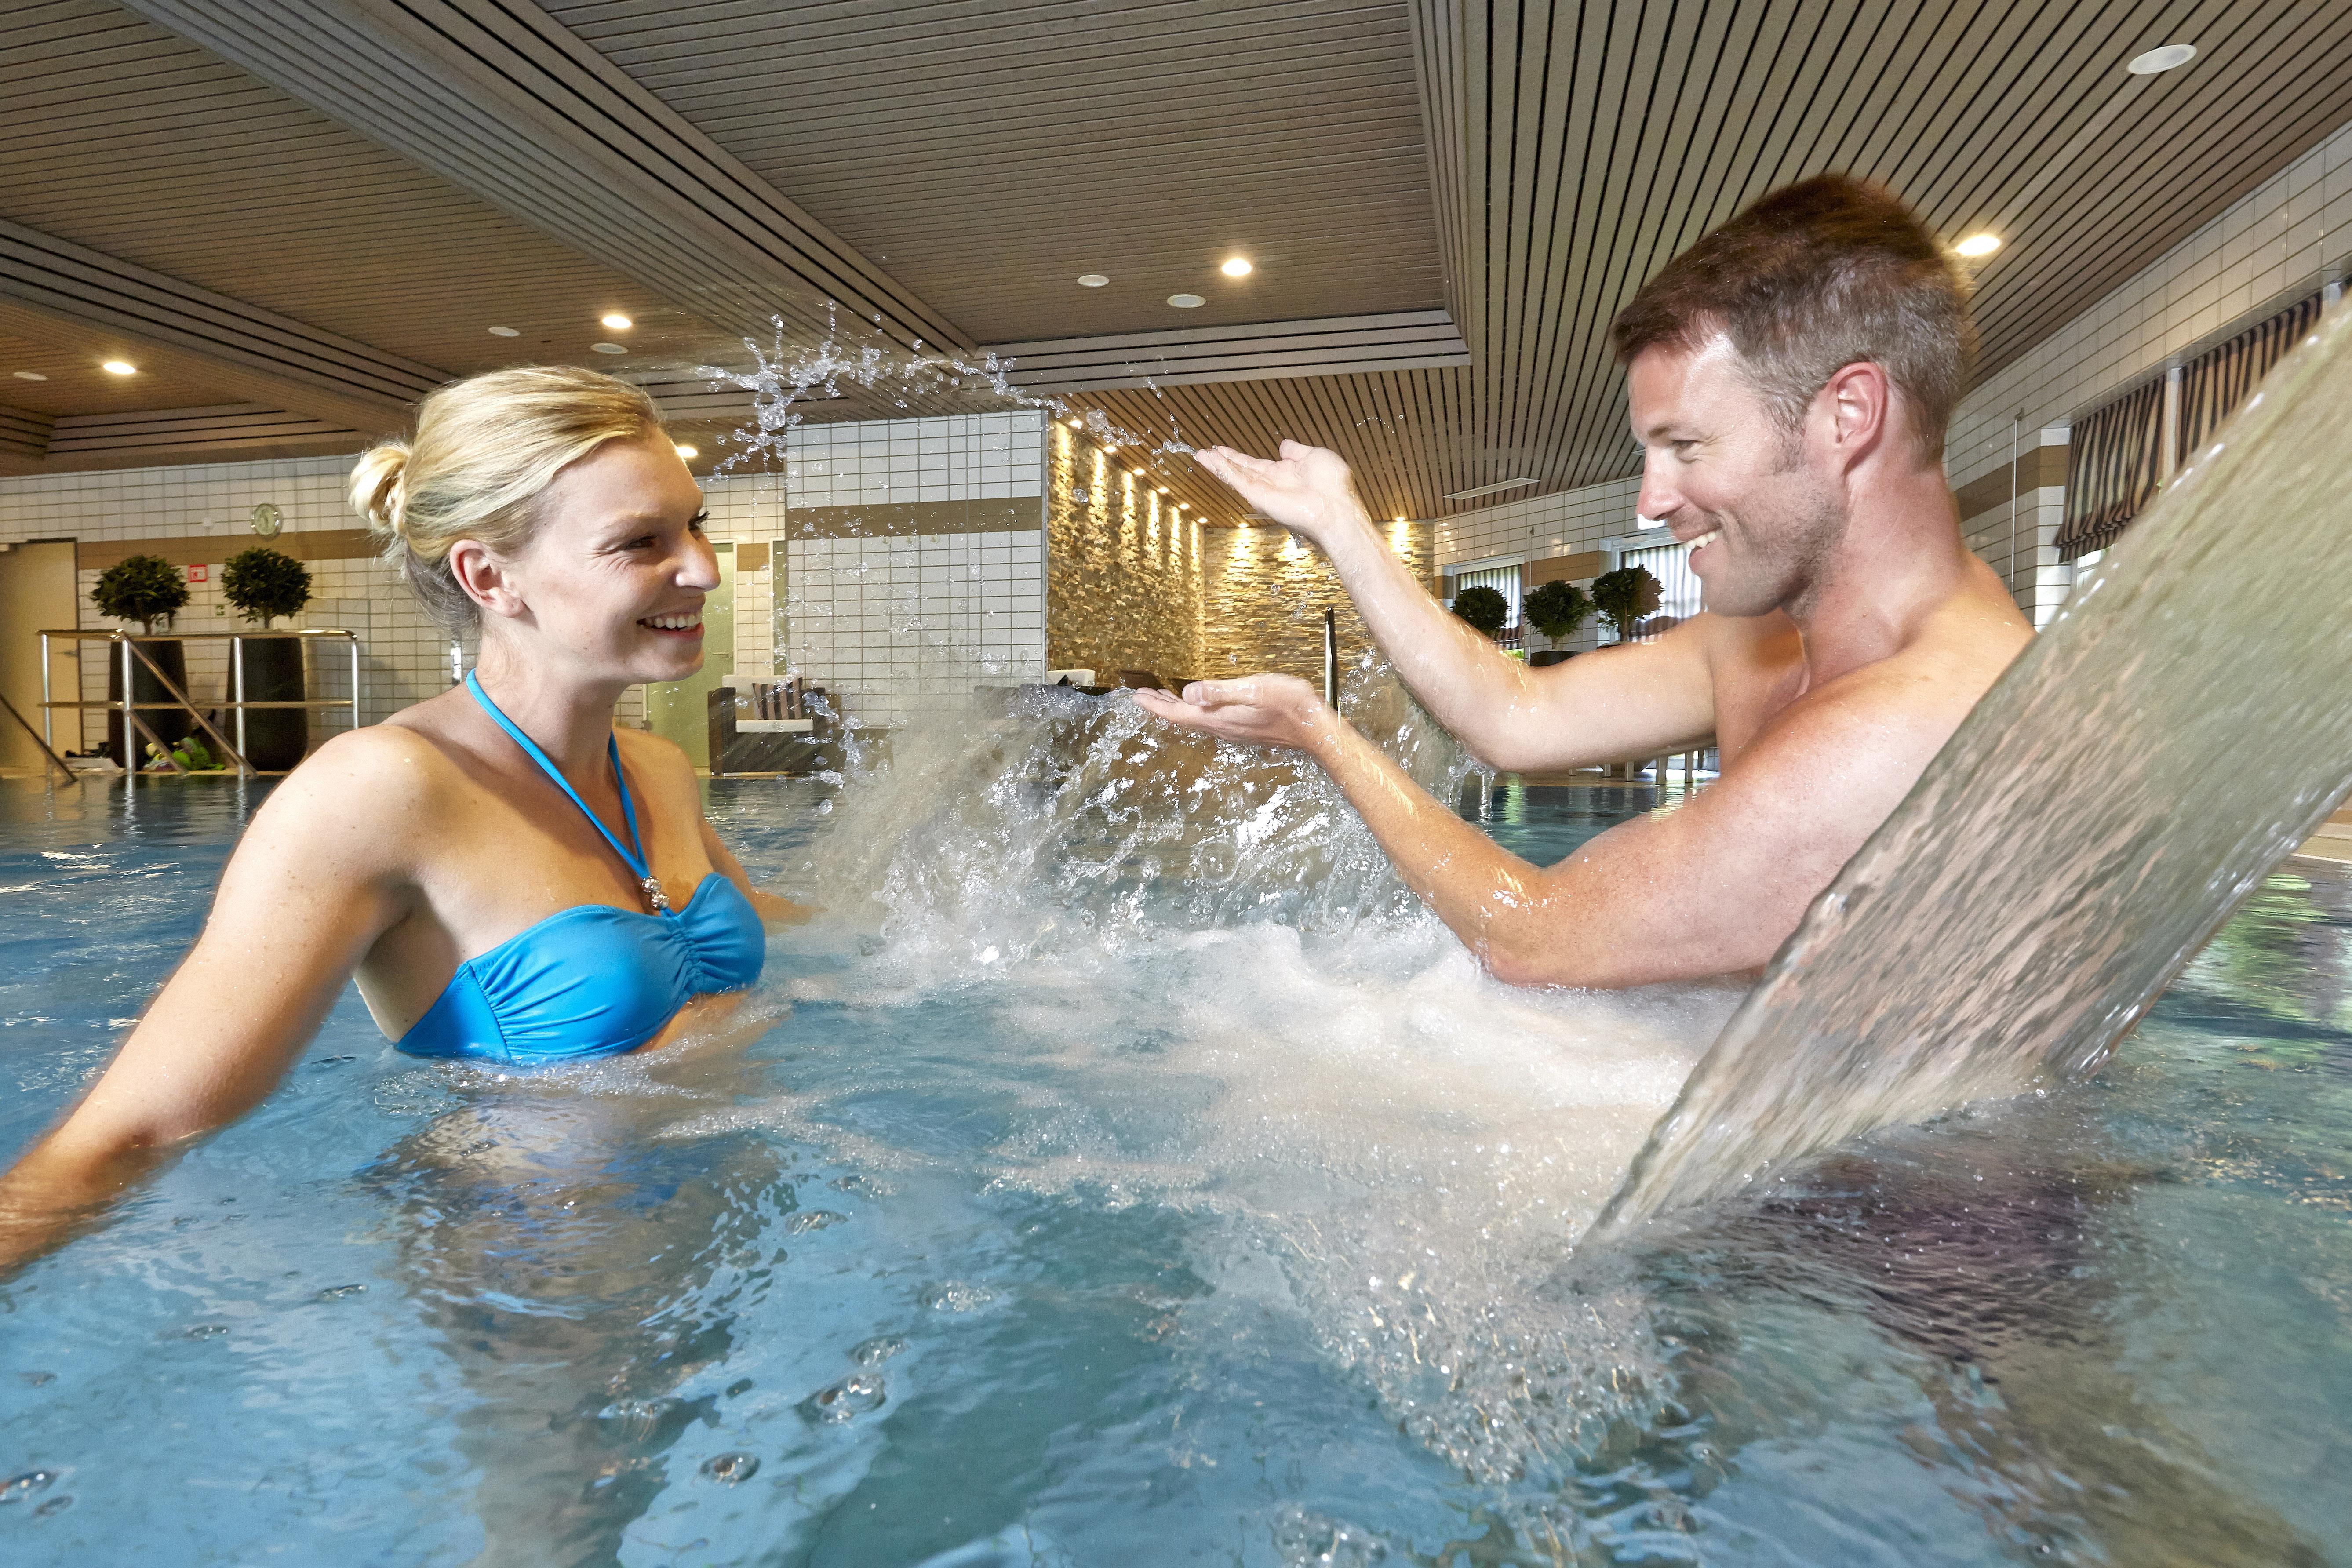 relexa hotel Harz-Wald - Braunlage - Innenpool